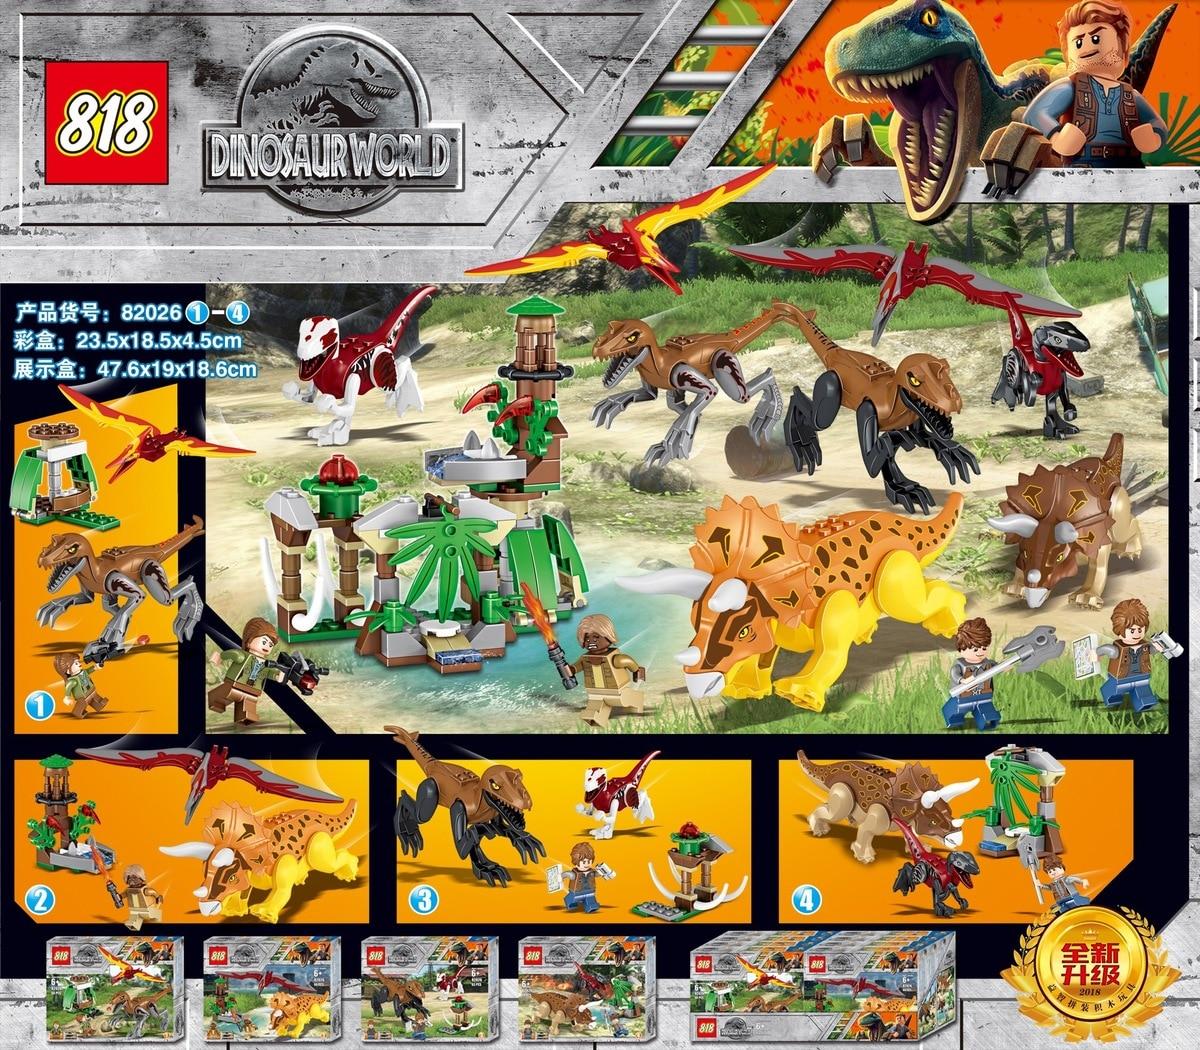 82026 Tyrannosaurus Triceratops Pterosaurs Dinosaur  Building Block Bricks Toys For Kid Compatible Legoings  Jurassic World Gift